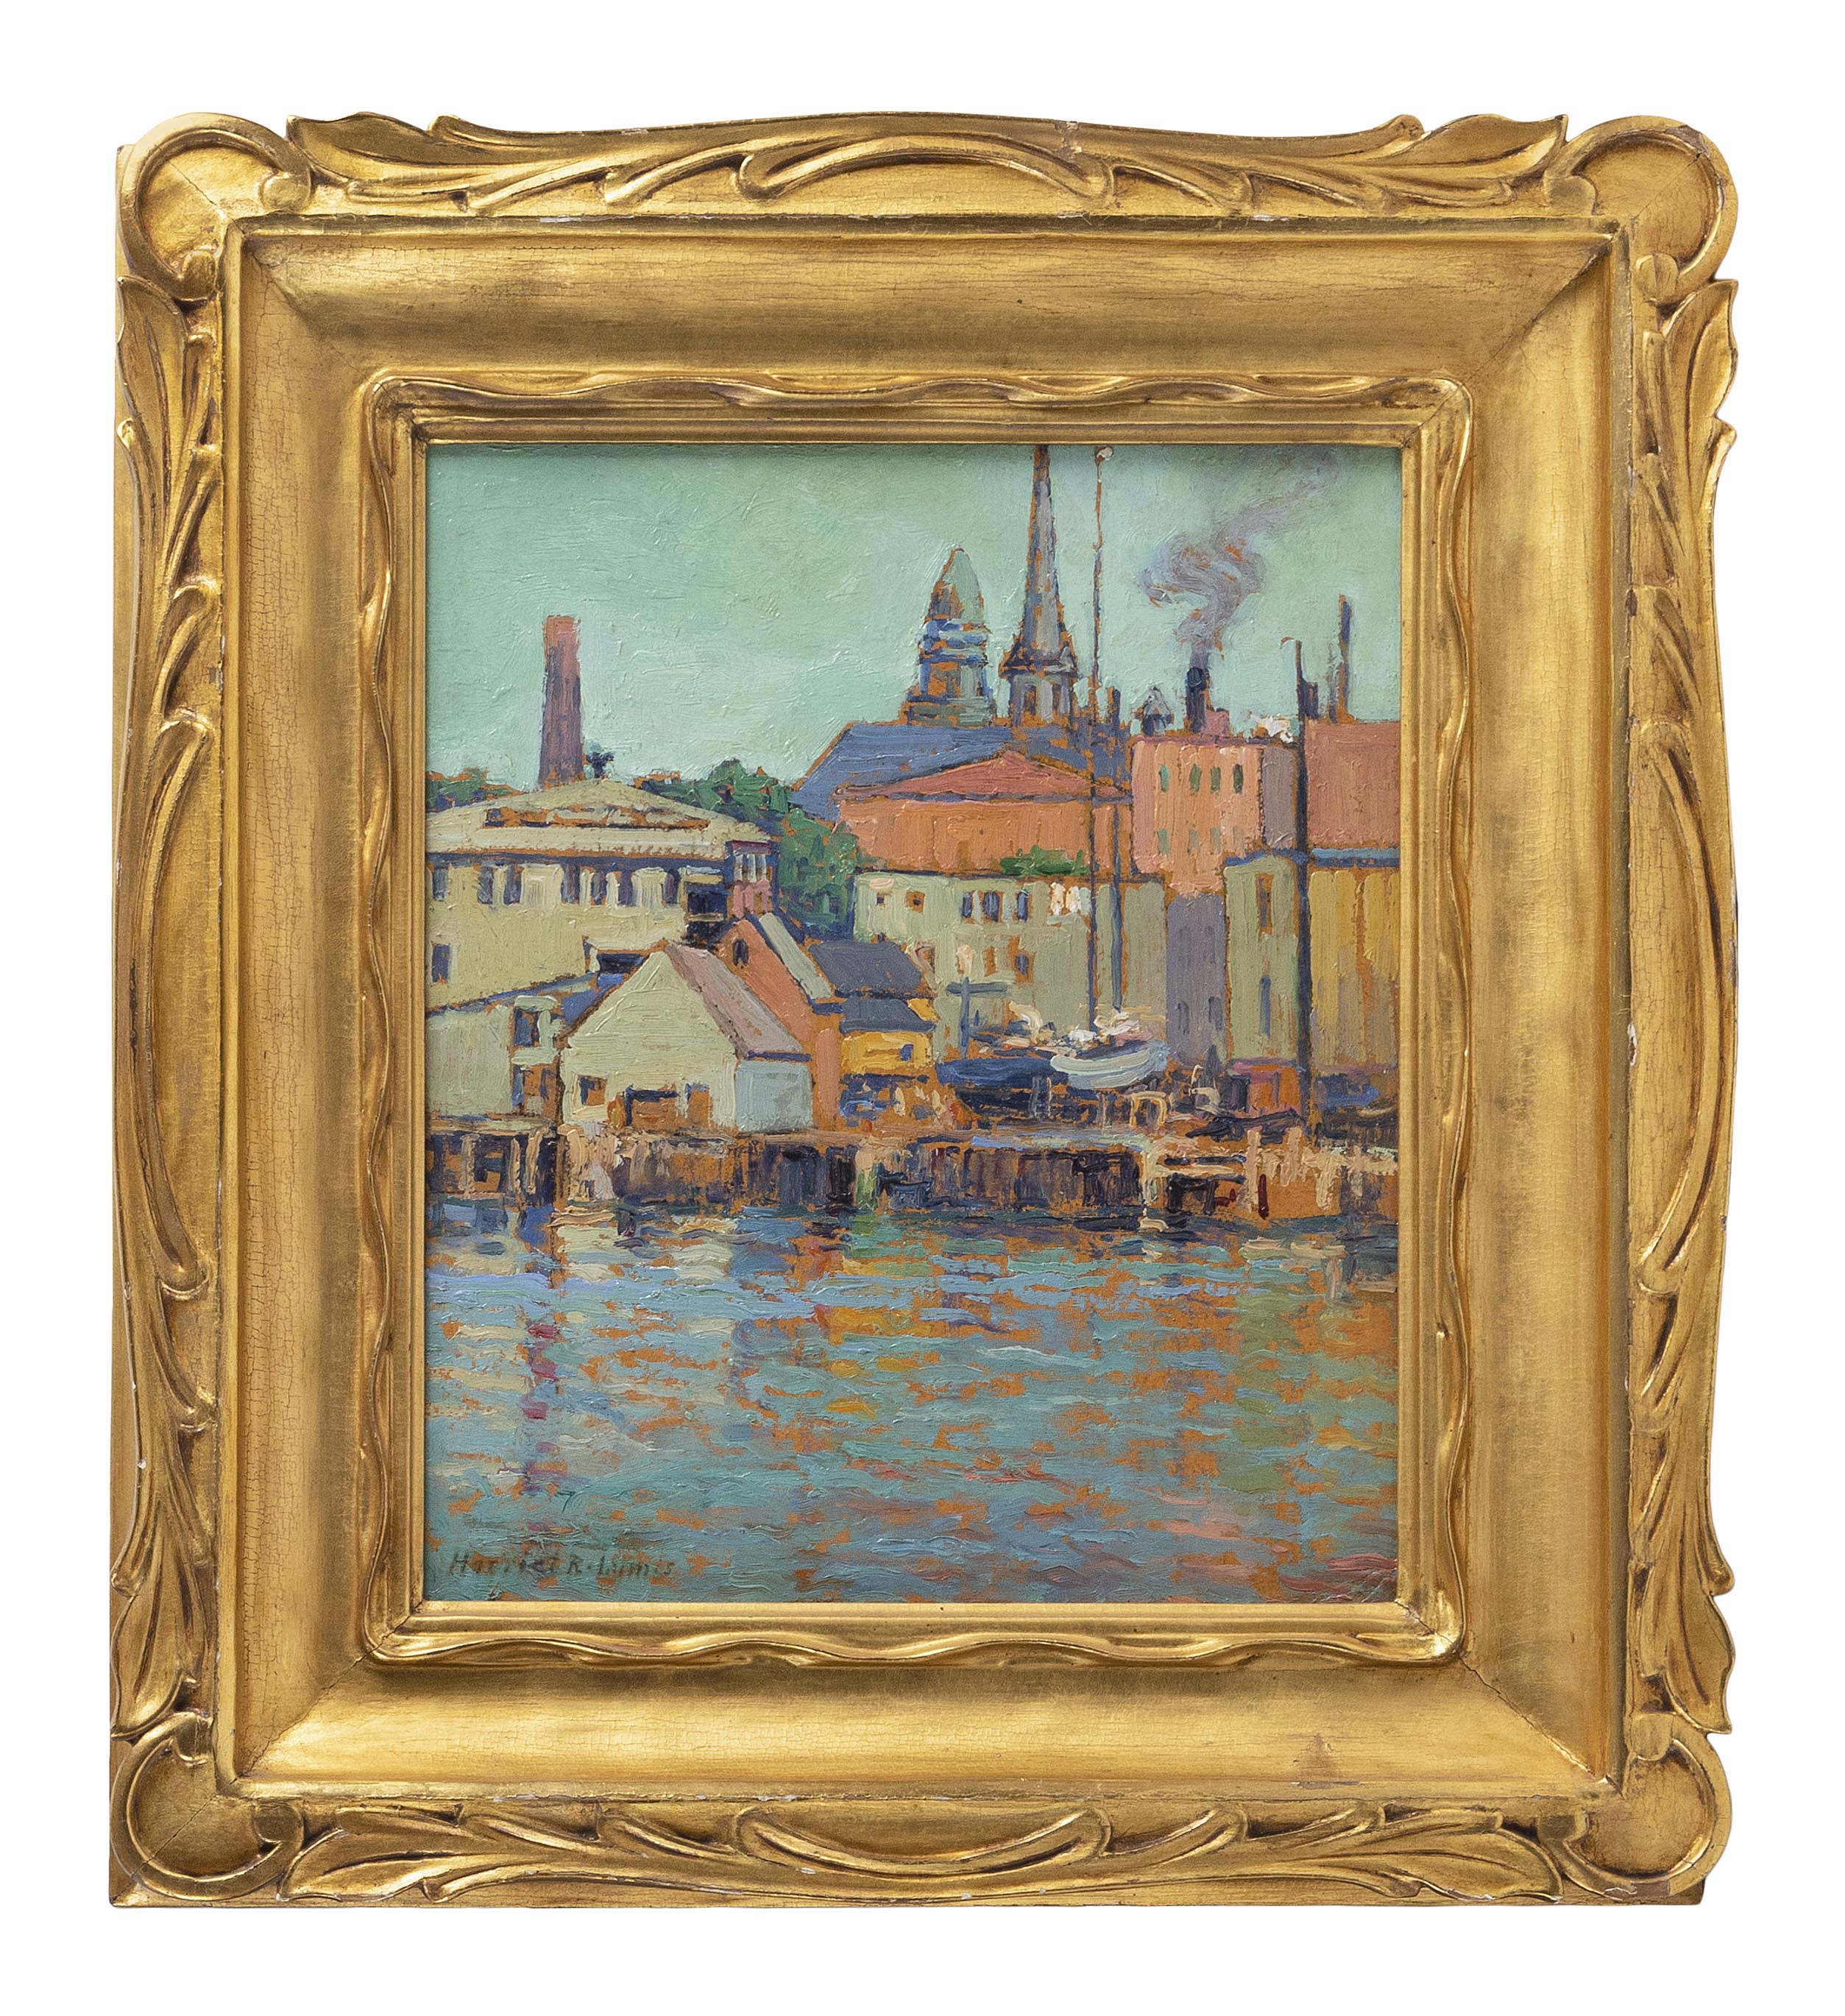 "HARRIET RANDALL LUMIS (Massachusetts/Connecticut, 1870-1953), ""Gloucester Wharf""., Oil on board, 12"" x 10"". Framed 17.5"" x 15.5""."